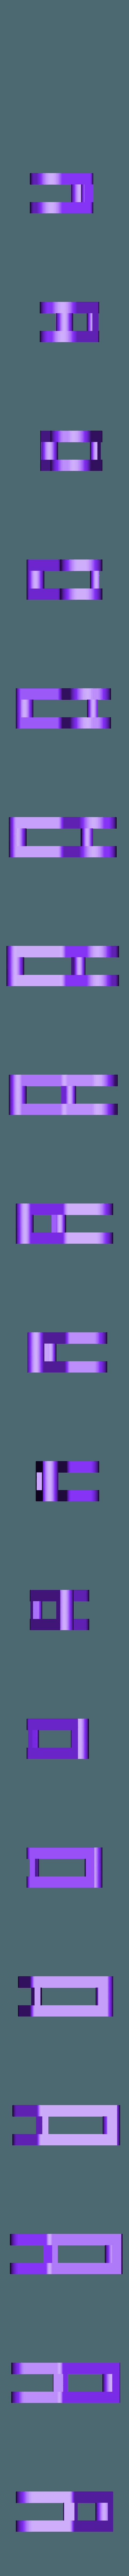 Hook.stl Download free STL file Hook Keeper for fishing rod • Design to 3D print, Domi1988